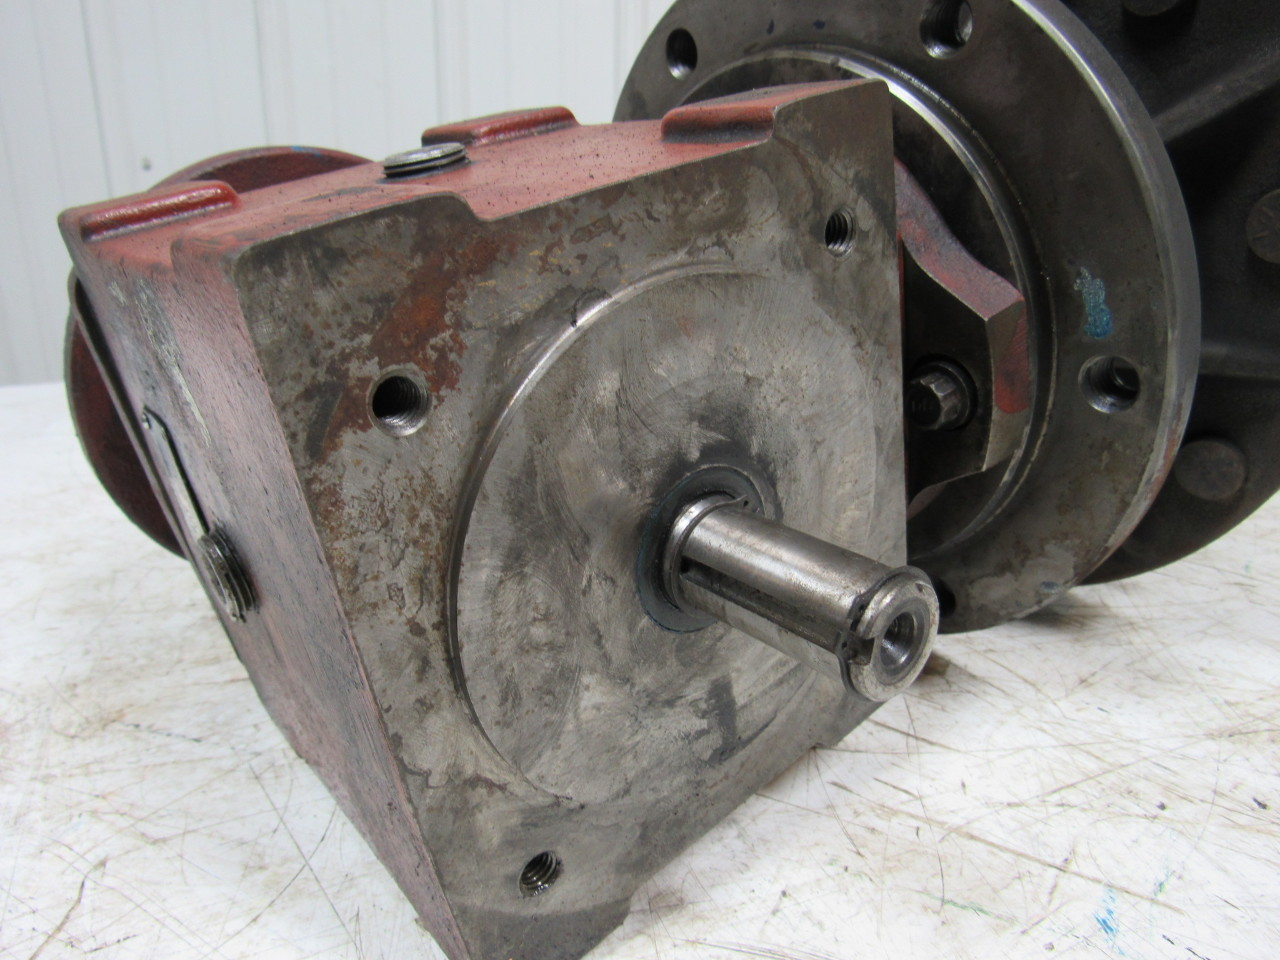 Right Angle Wheel : Fairfield mfg ra right angle drive w torque hub wheel